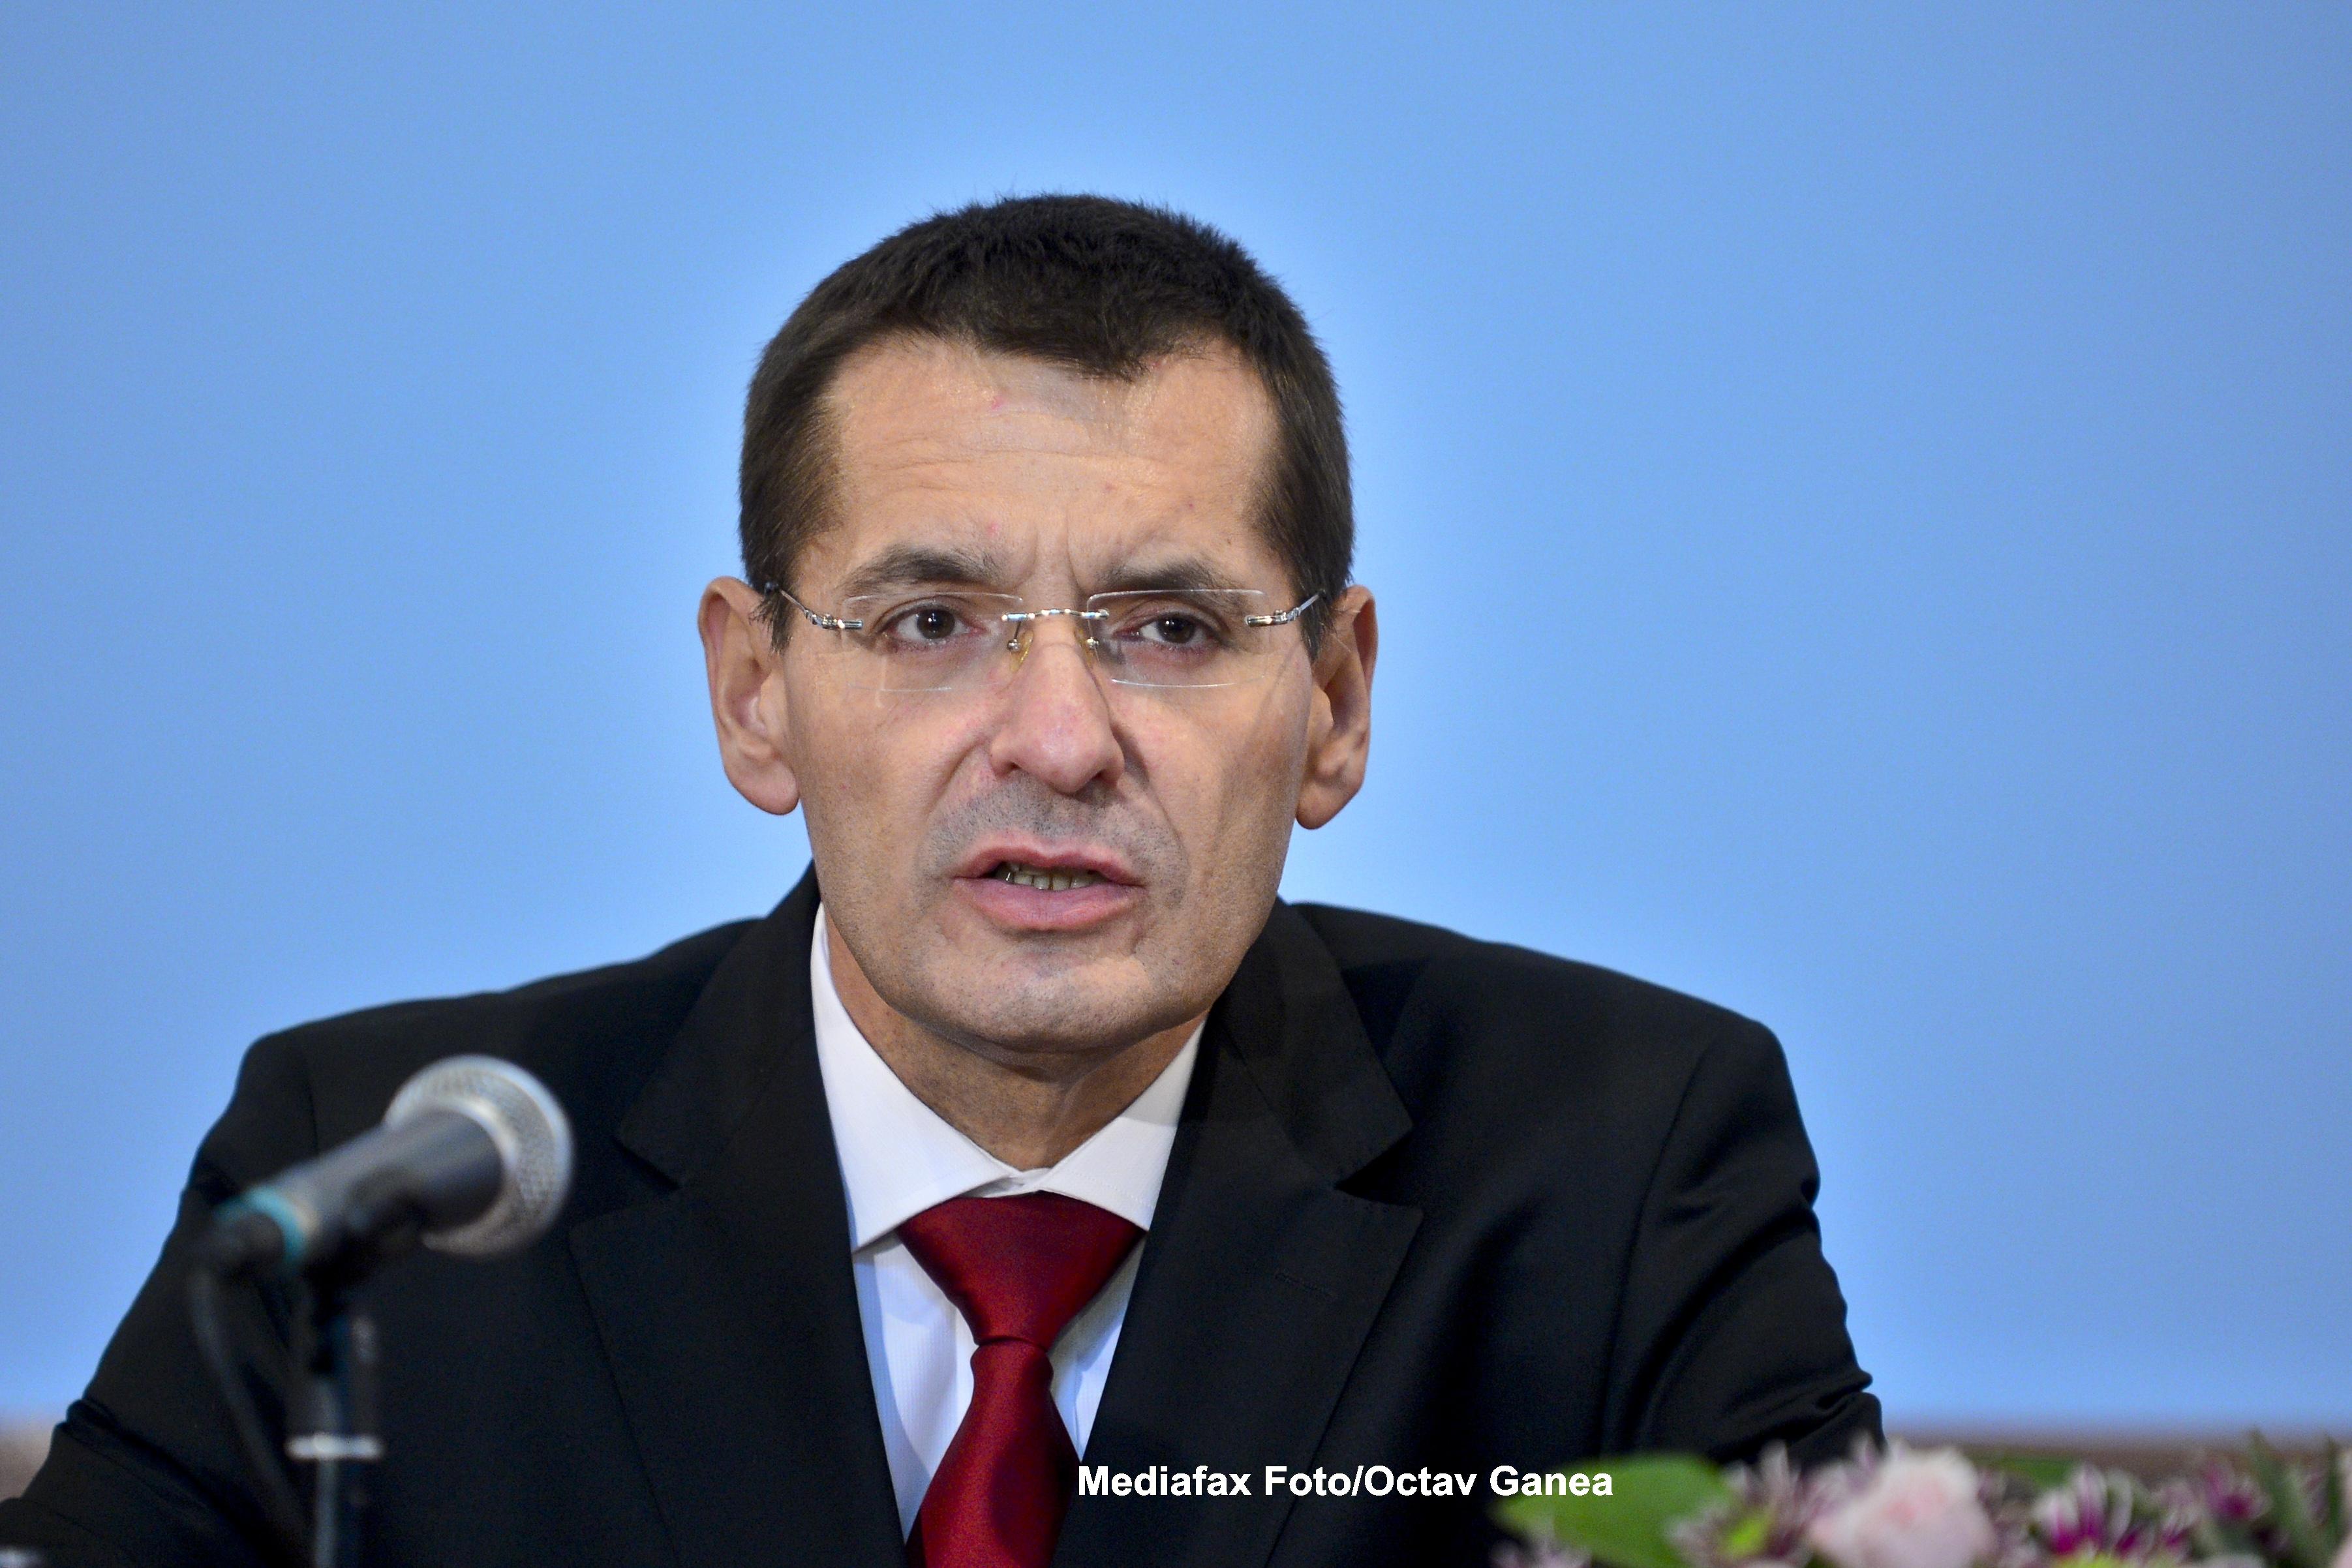 Petre Toba: In prima zi a campaniei electorale, la nivel national au fost inregistrate noua sesizari